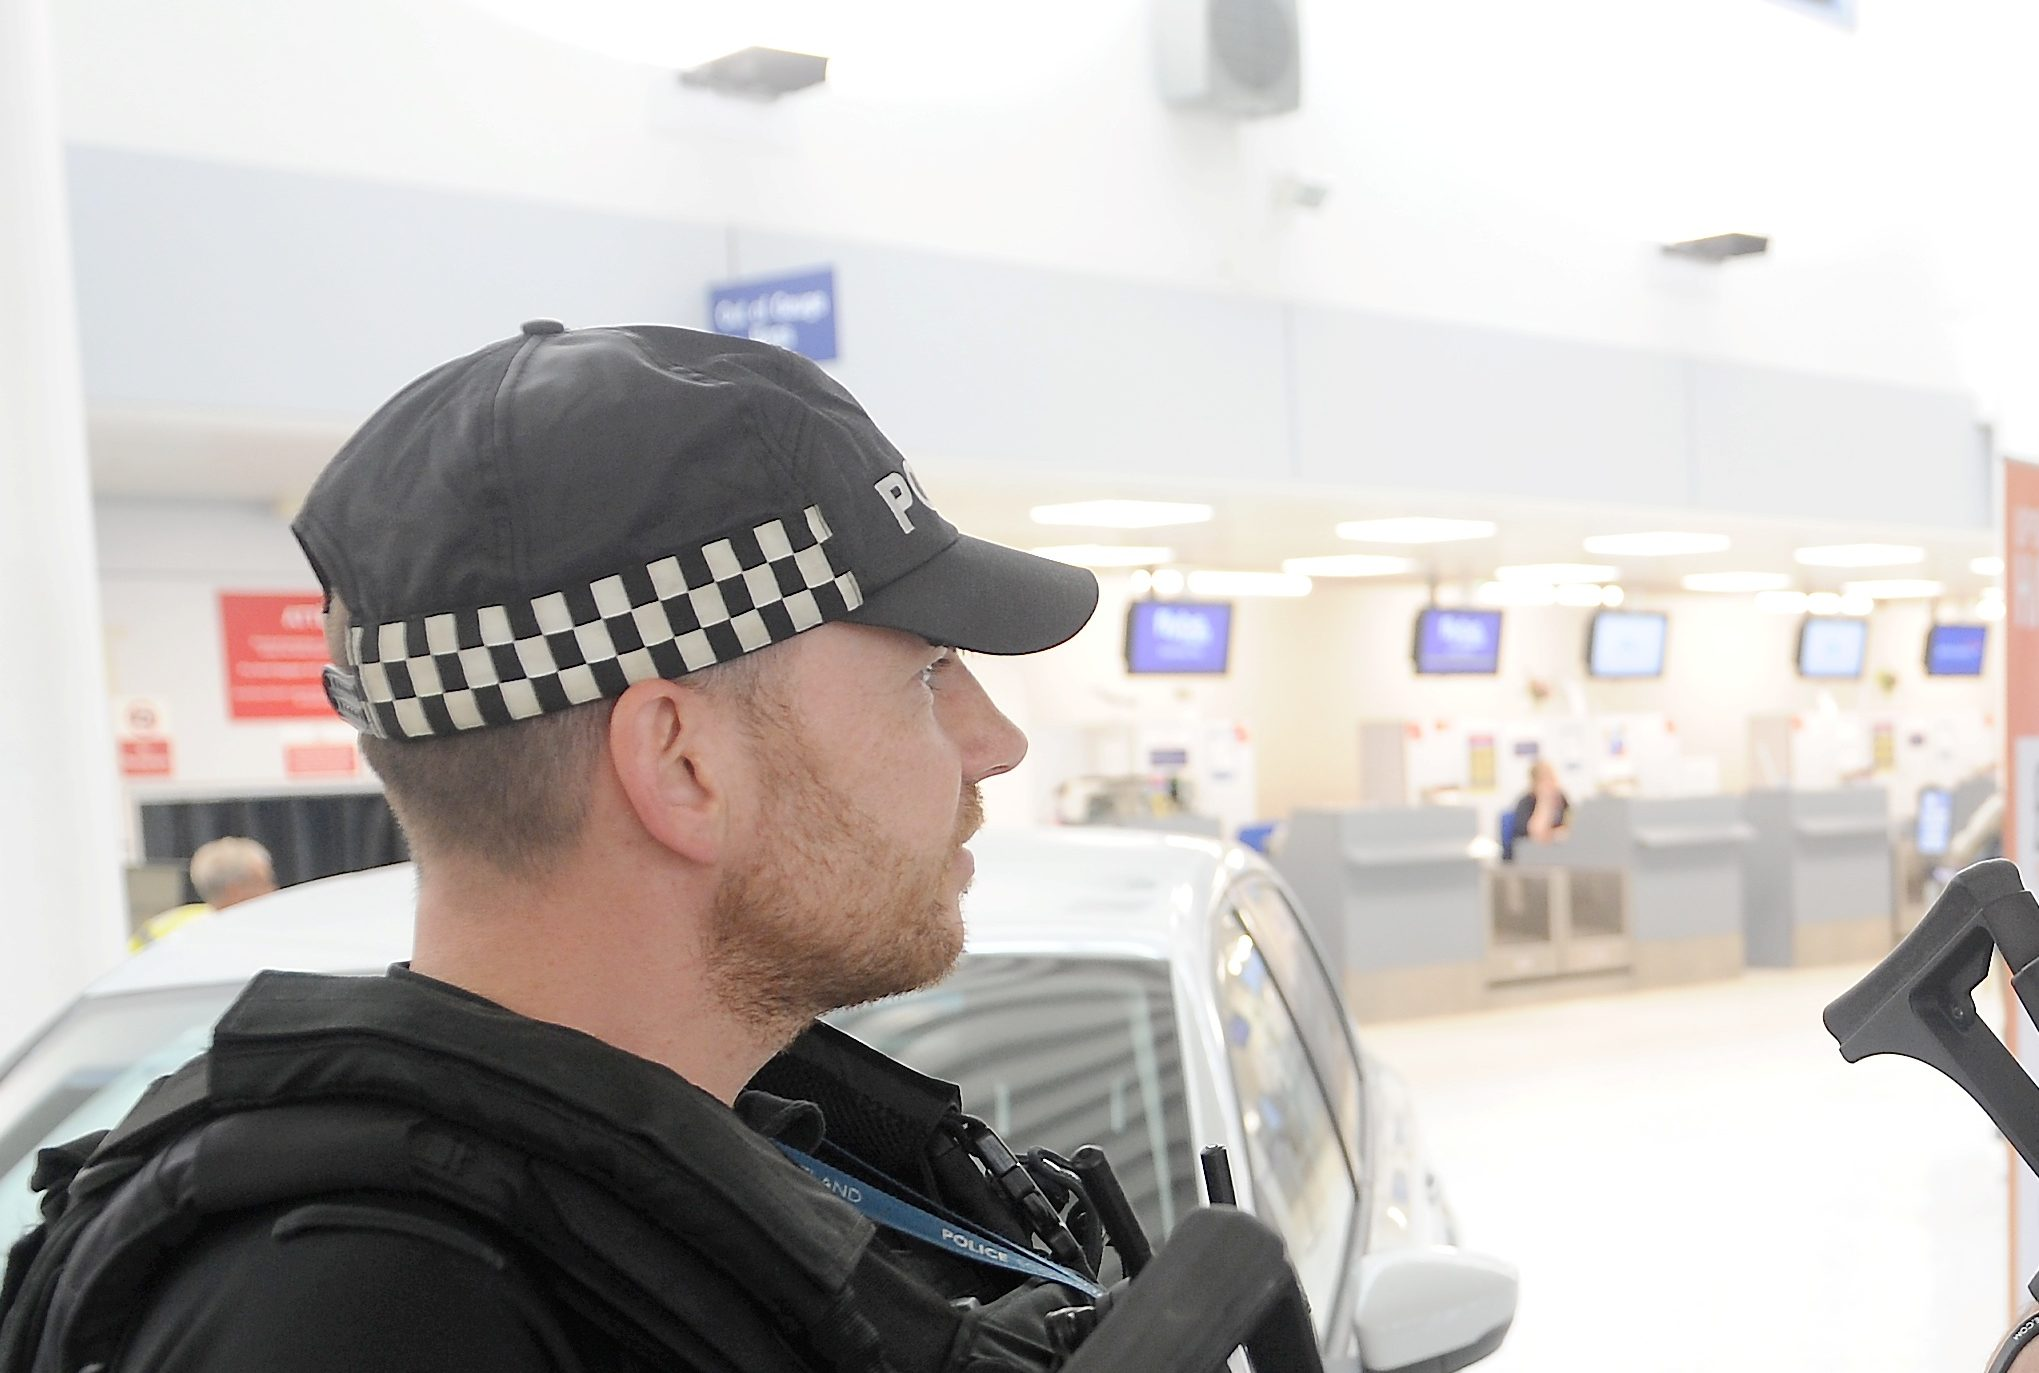 Armed Police wear unisex baseball caps.